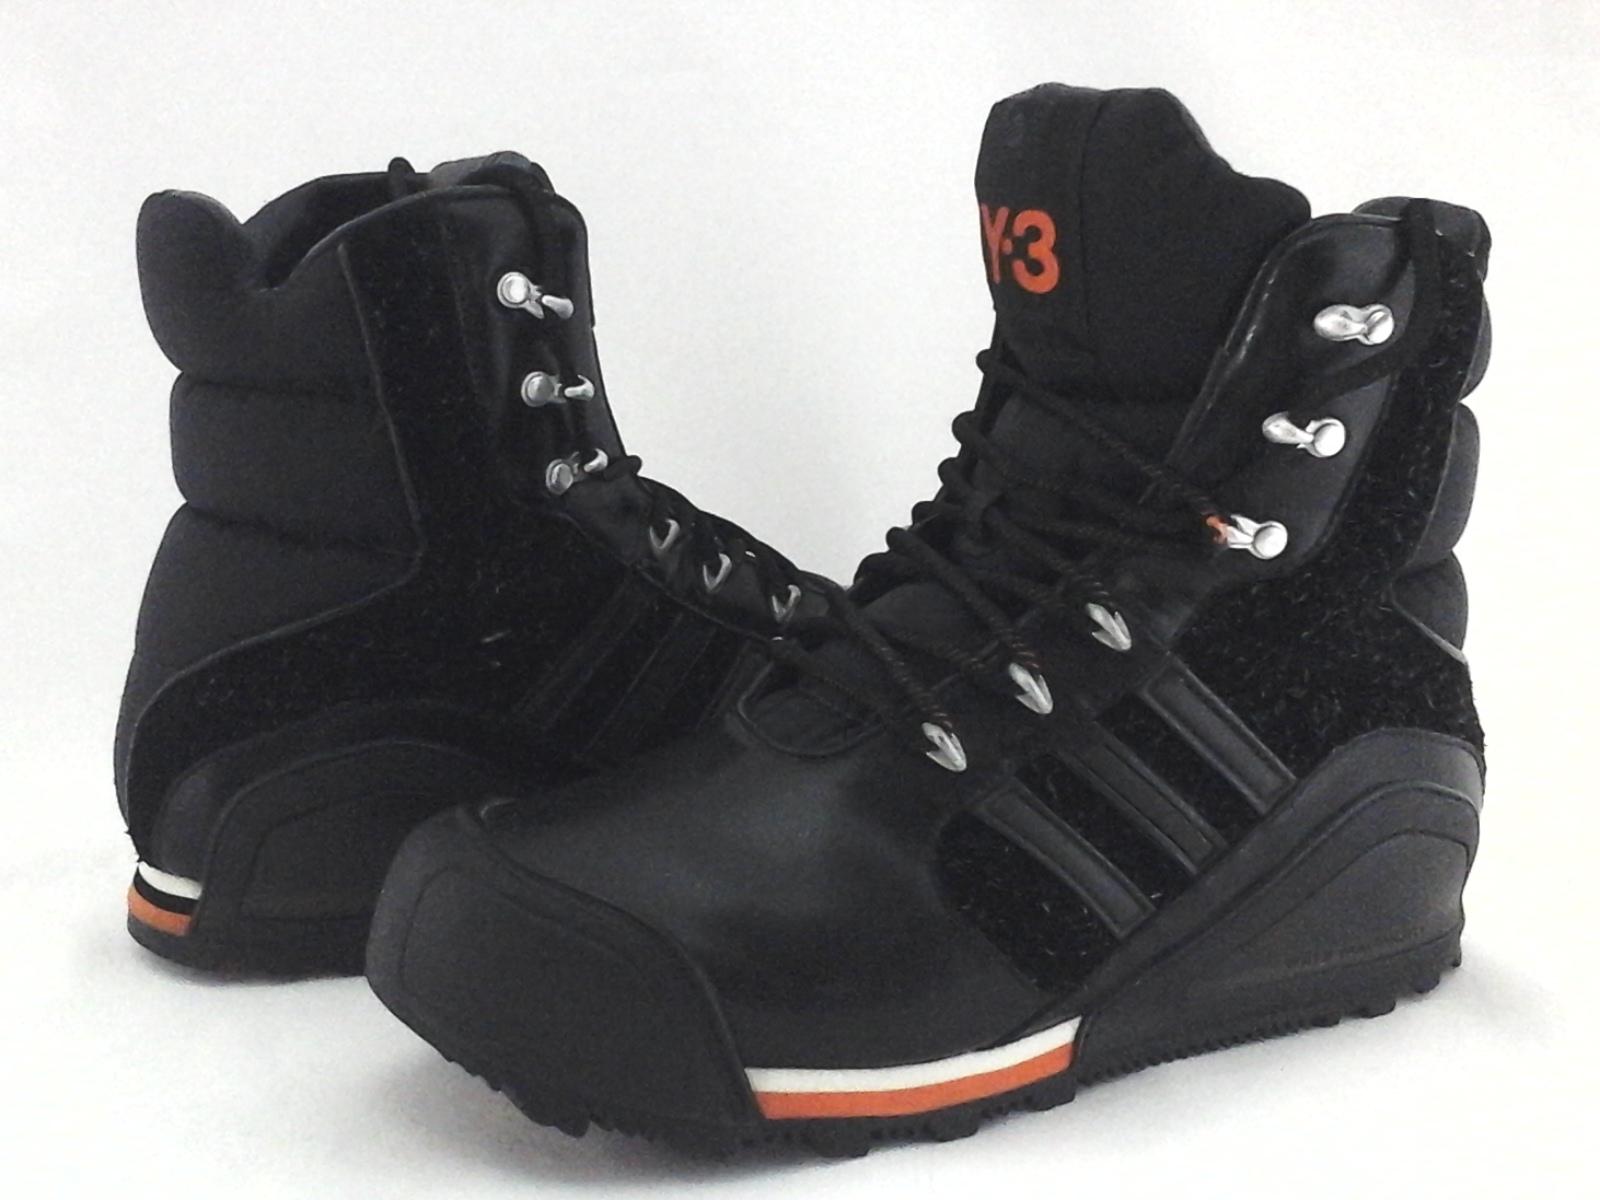 09f453c65b68 ADIDAS Y-3 Yohji Yamamoto Hiking Boots Black 678802 Sneakers Men s US 8.5  EU 42